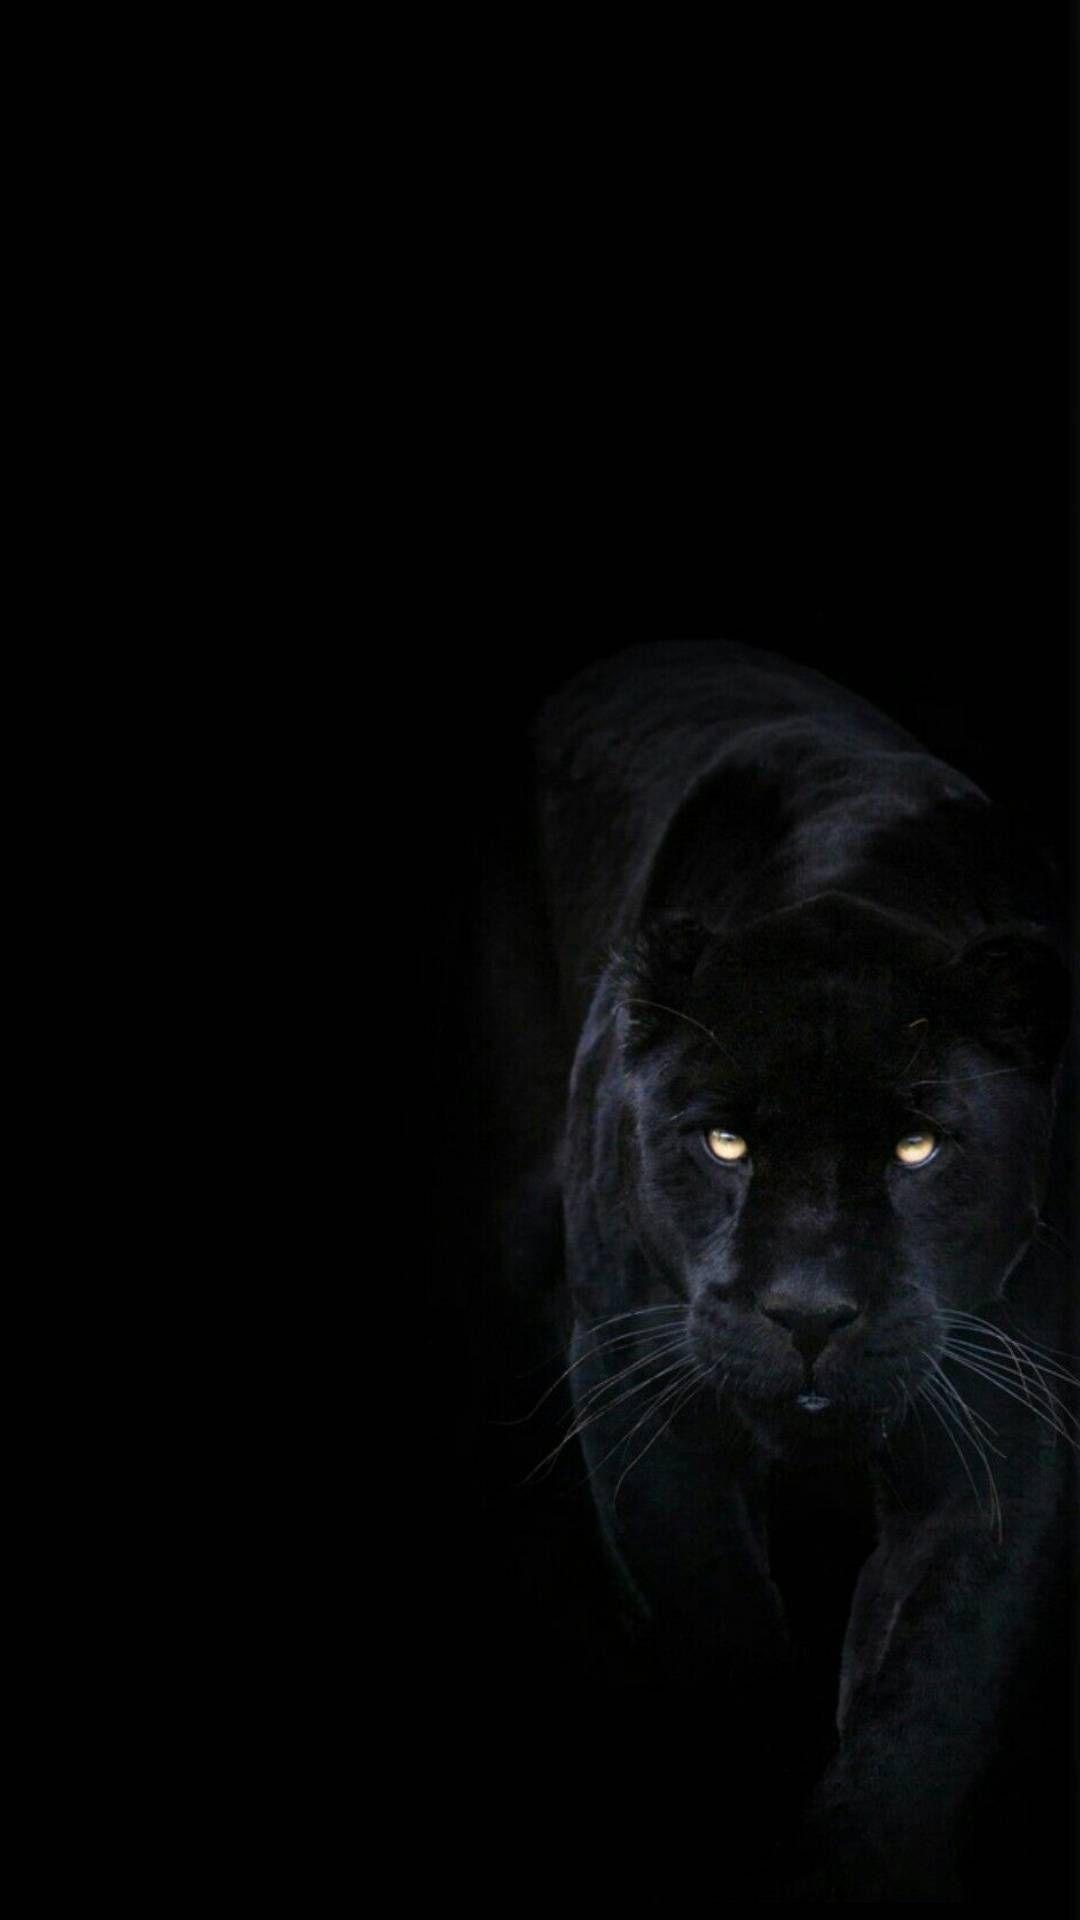 Black Jaguar Wallpaper Posted By Ryan Anderson